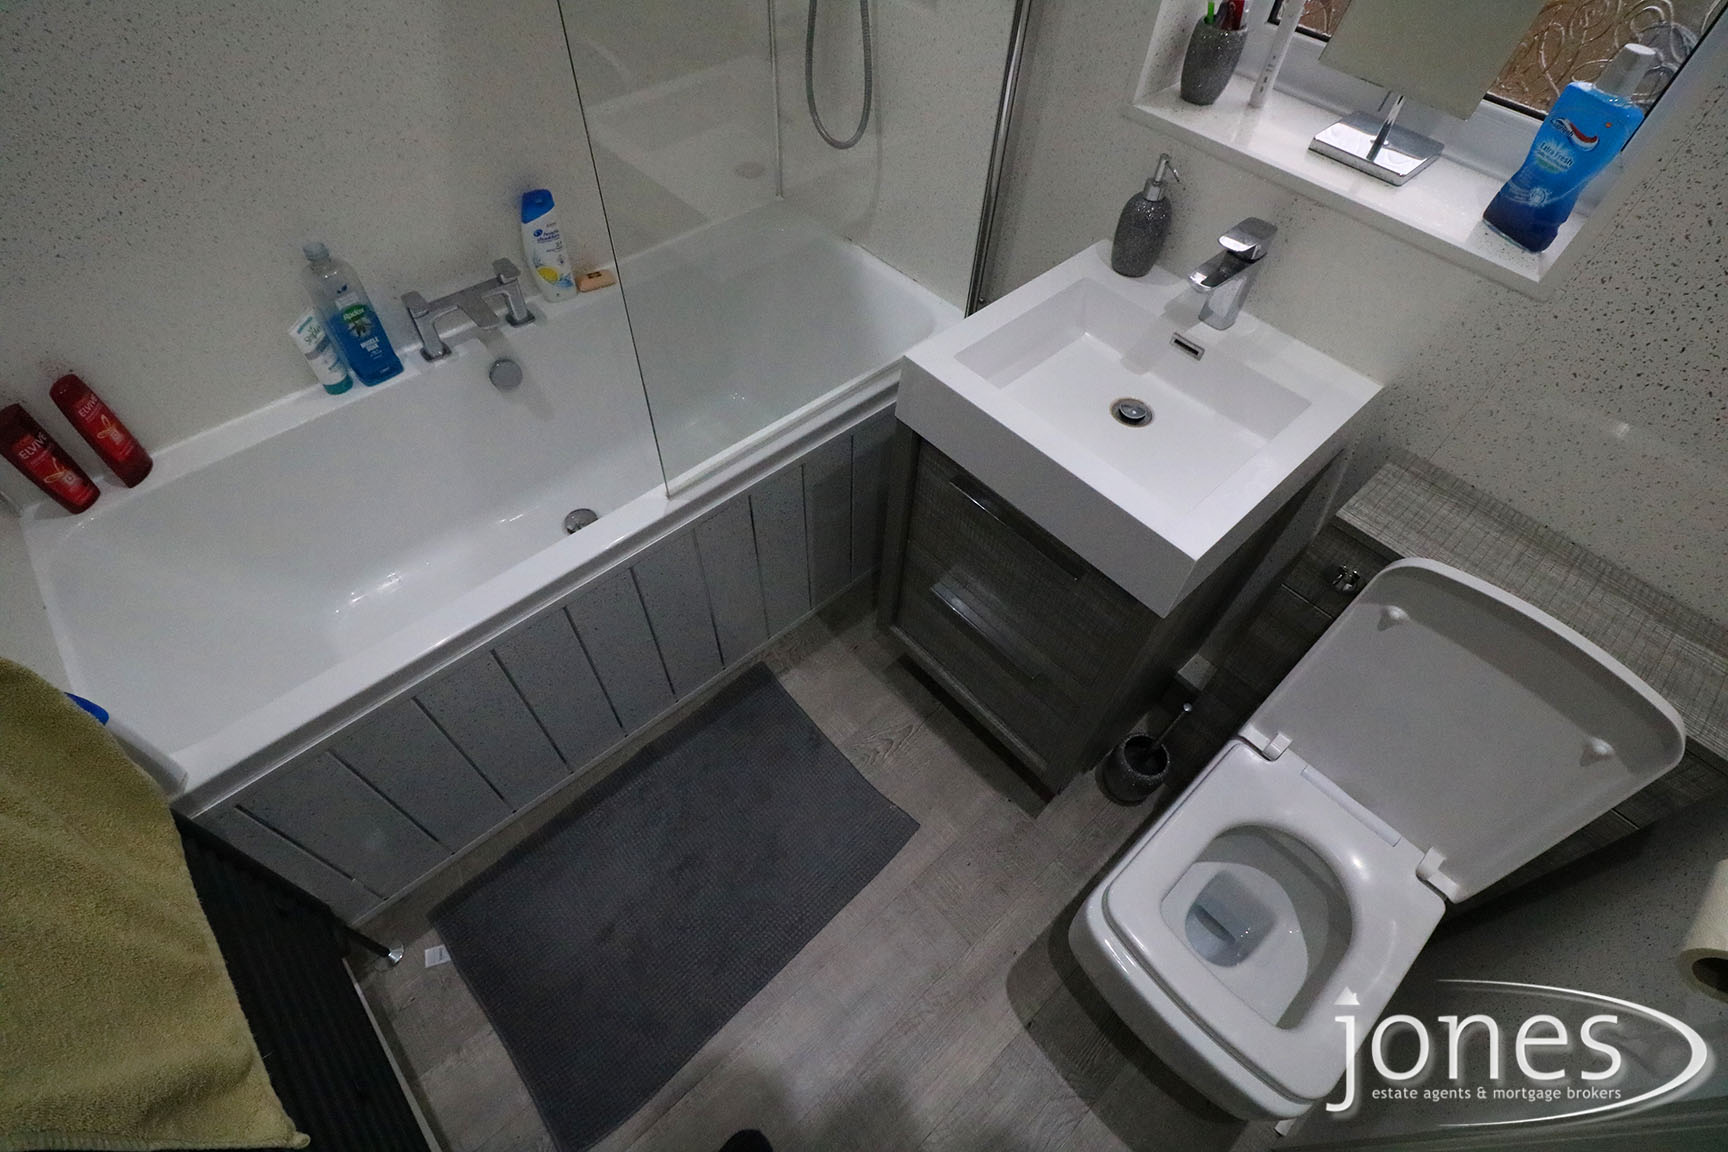 Home for Sale Let - Photo 11 Feetham Avenue, Darlington, DL1 2DY